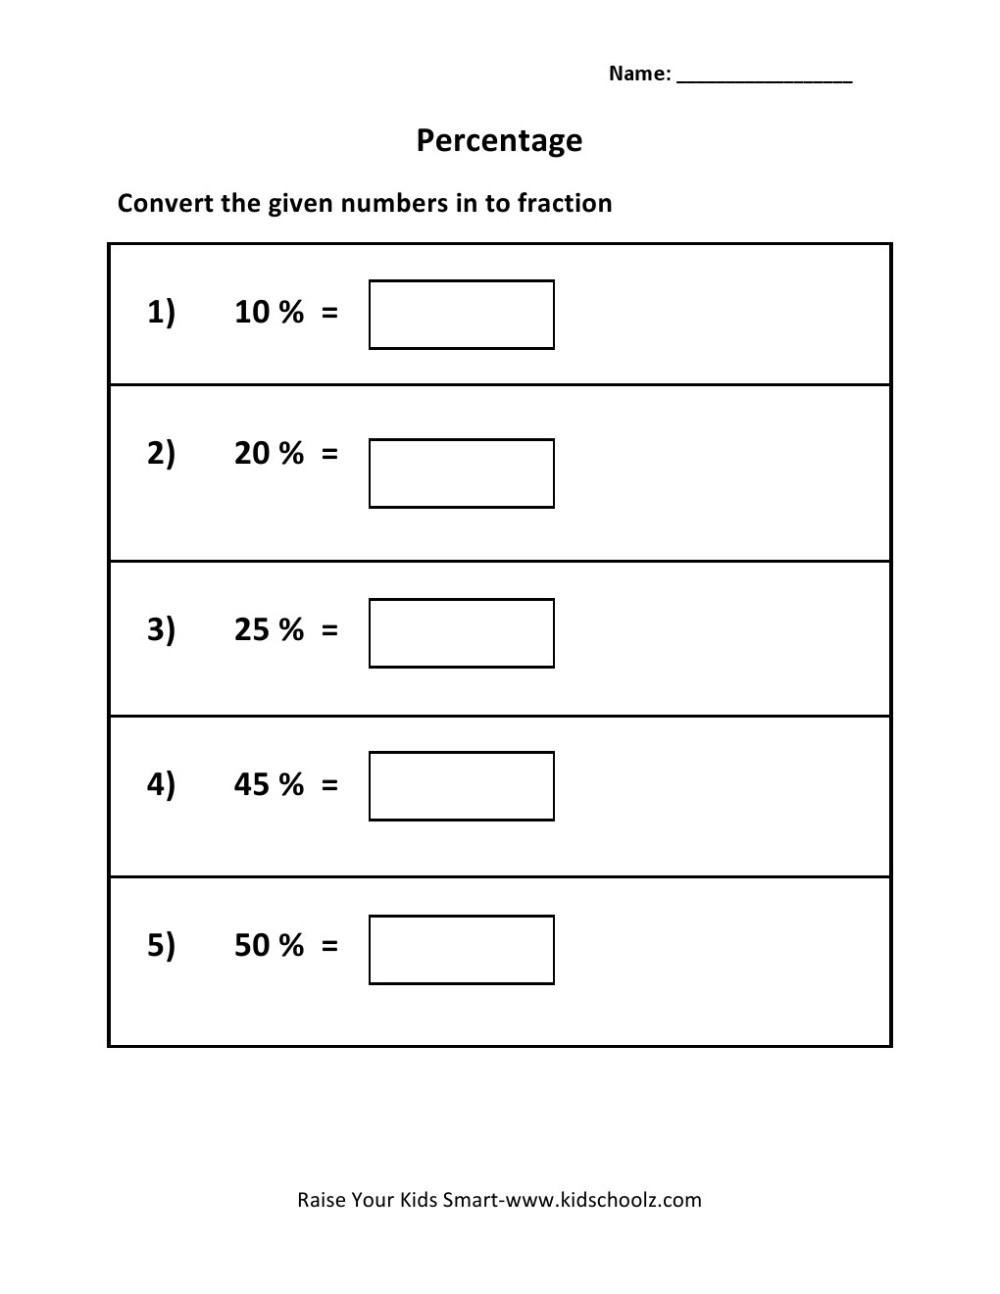 medium resolution of Grade 5 - Percentage To Fraction Worksheet 1 - Kidschoolz